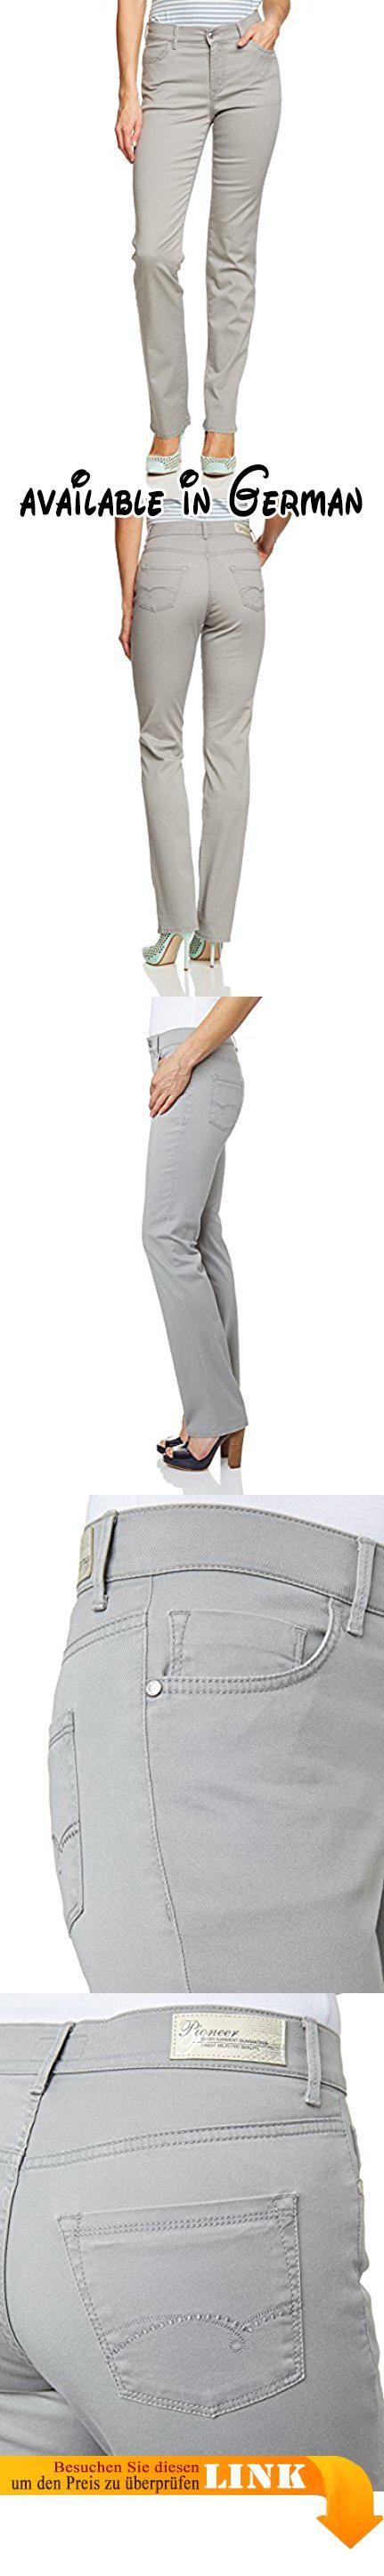 "Pioneer Damen Straight Leg Hose KATE, Gr. 46/L34, Grau (grey 82). Perfekt kombinierbar. Passform ""Regular Fit"". Toller Feintwill Powerstretch. Allrounder für den Sommer. Angenehmes Tragegefühl #Apparel #PANTS"